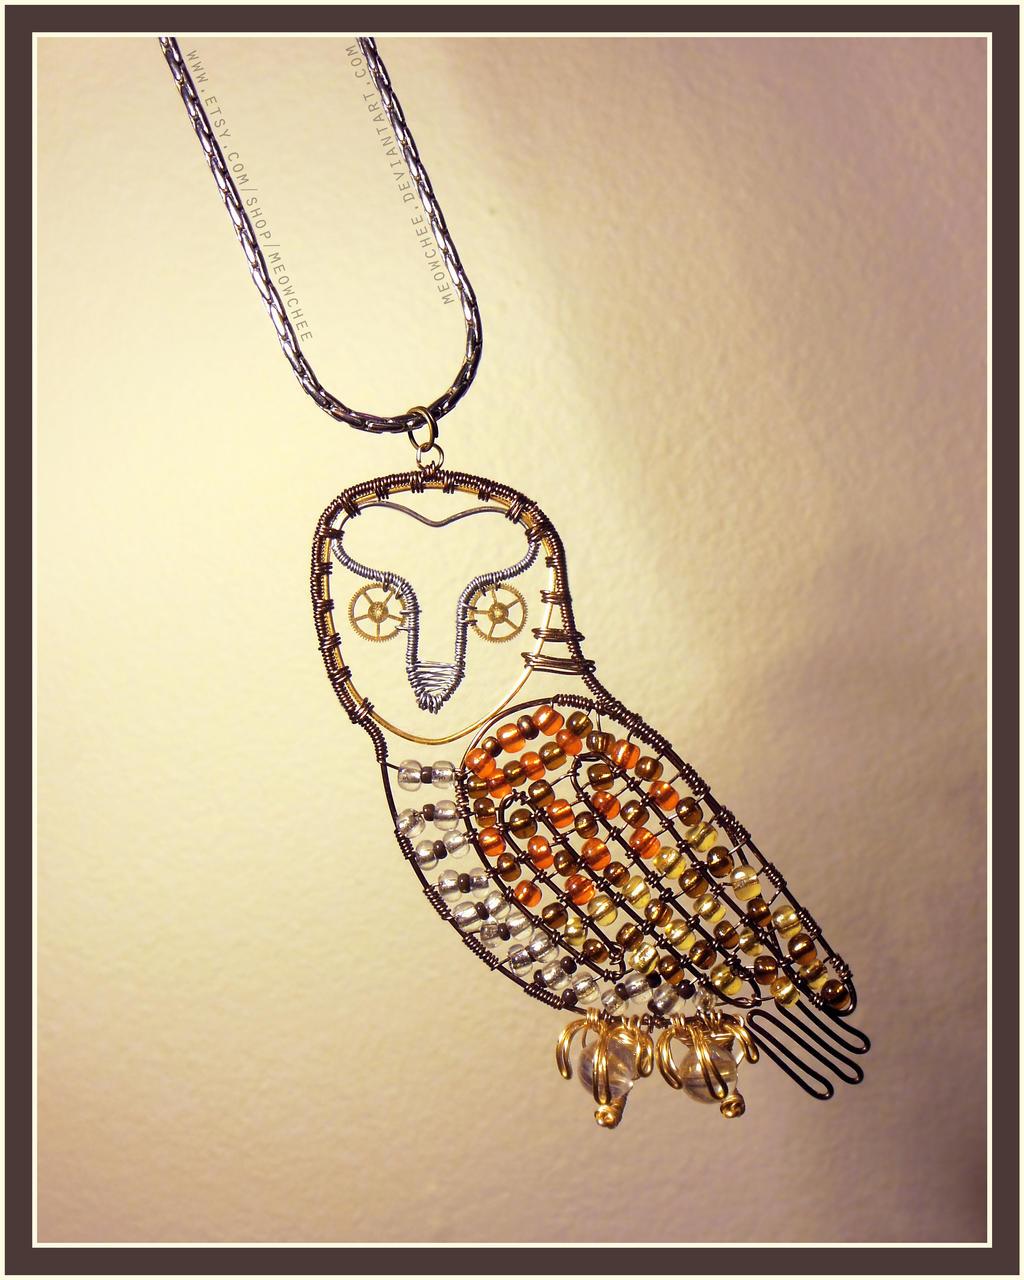 Steampunk Barn Owl Pendant by Meowchee